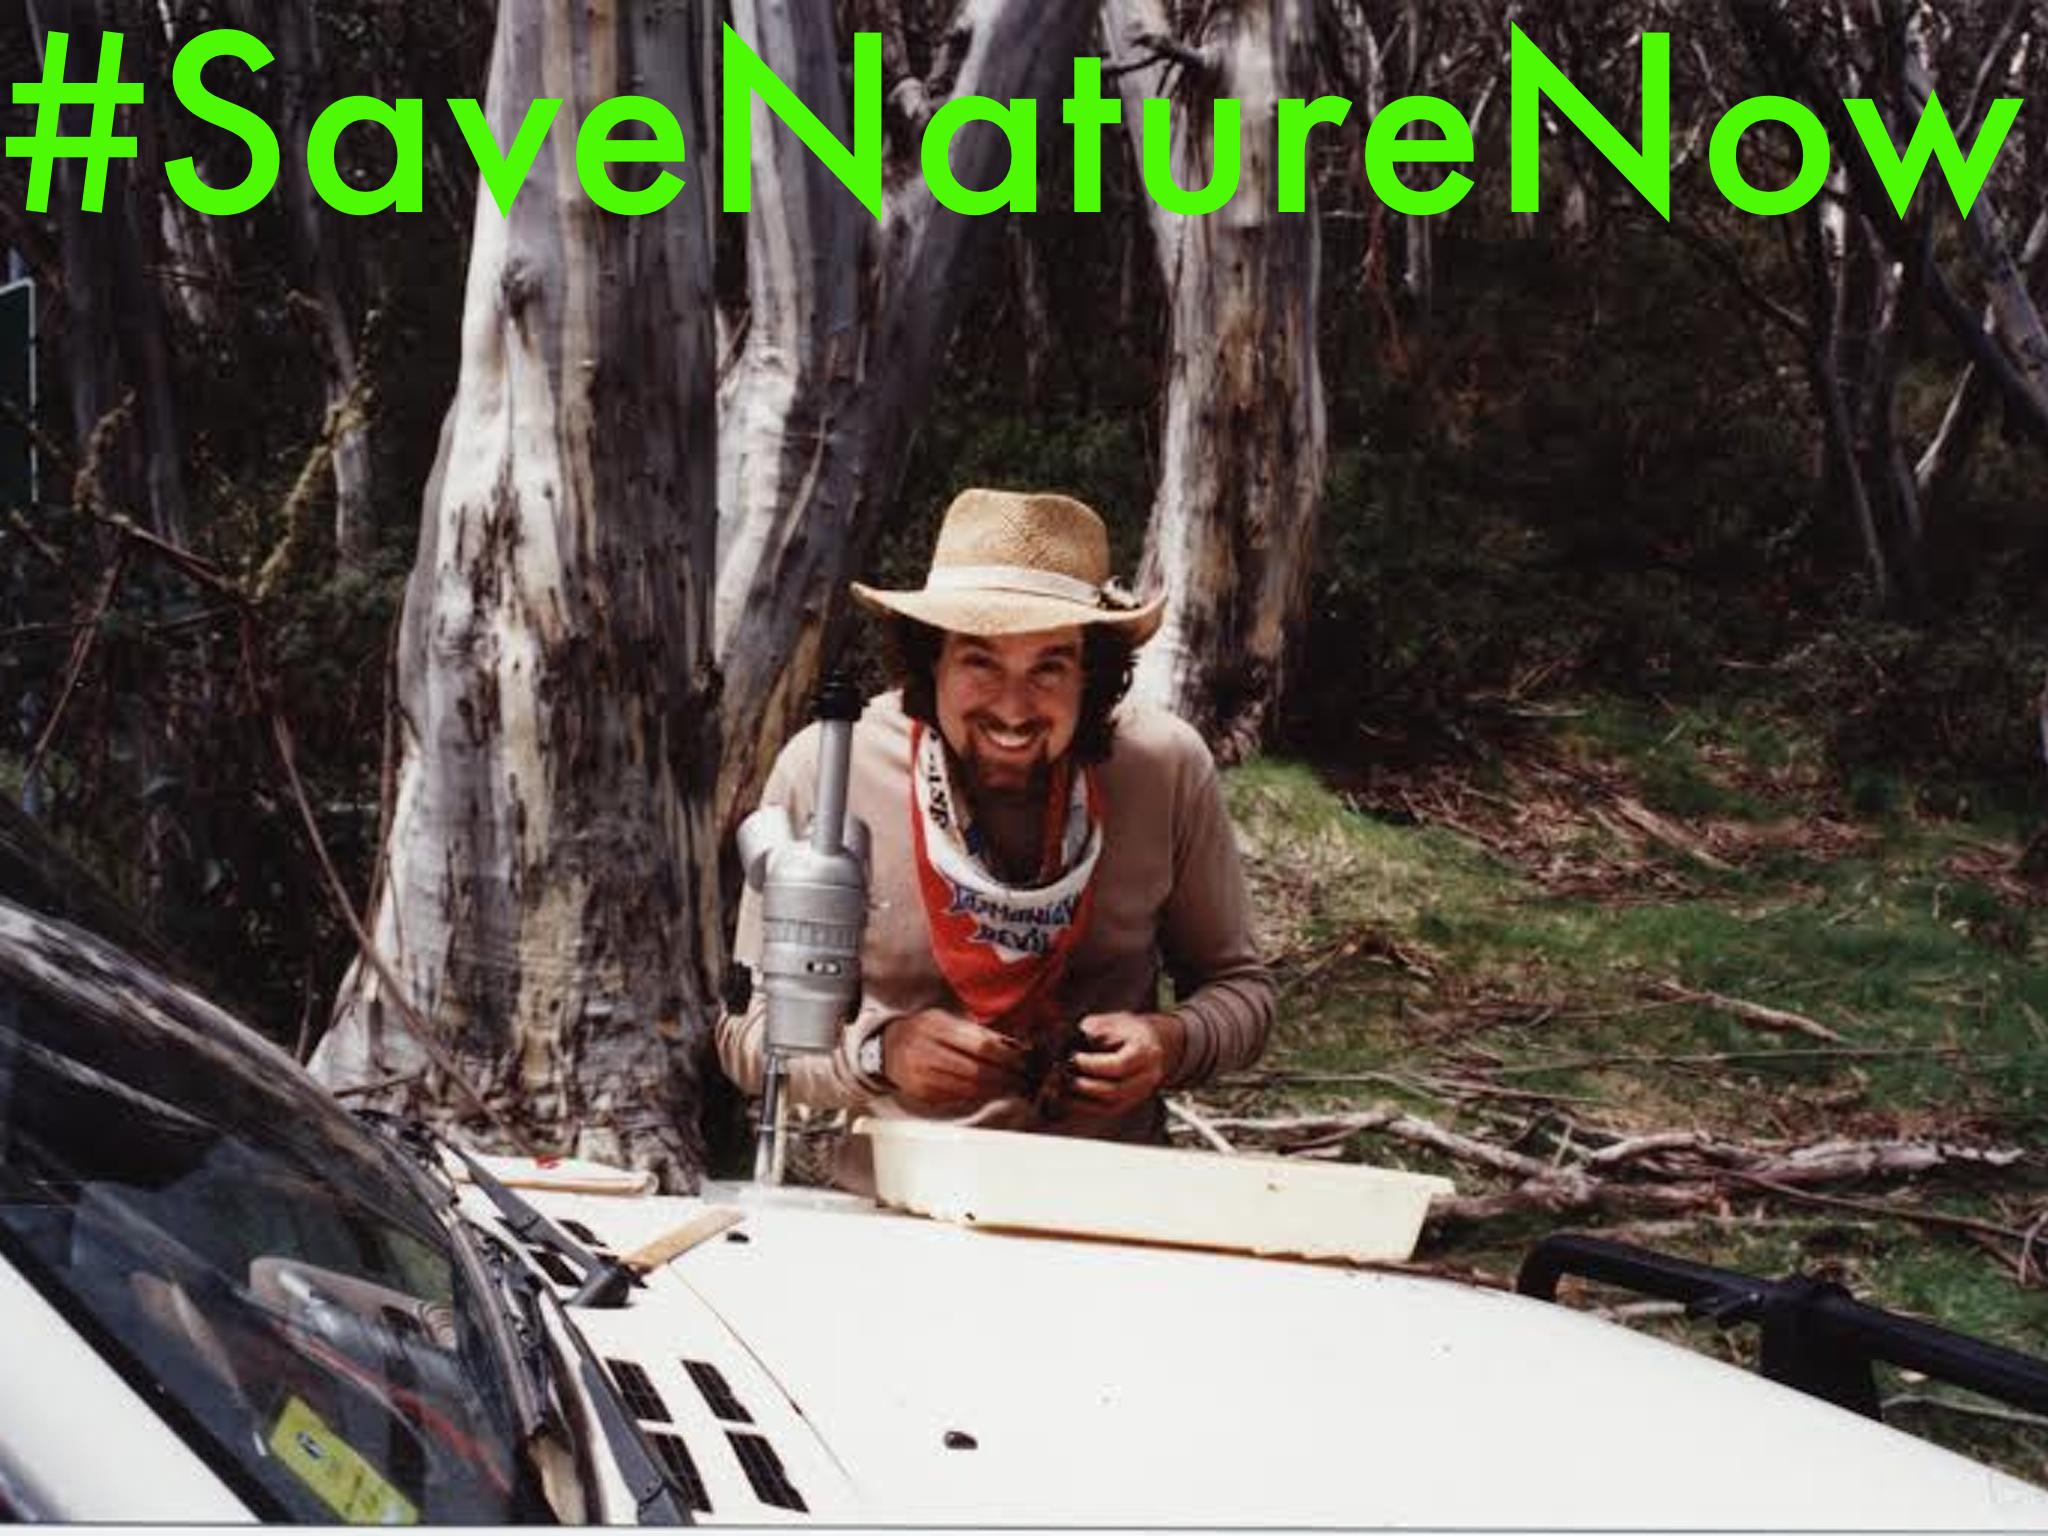 #SaveNatureNow - Australia field work.jpg